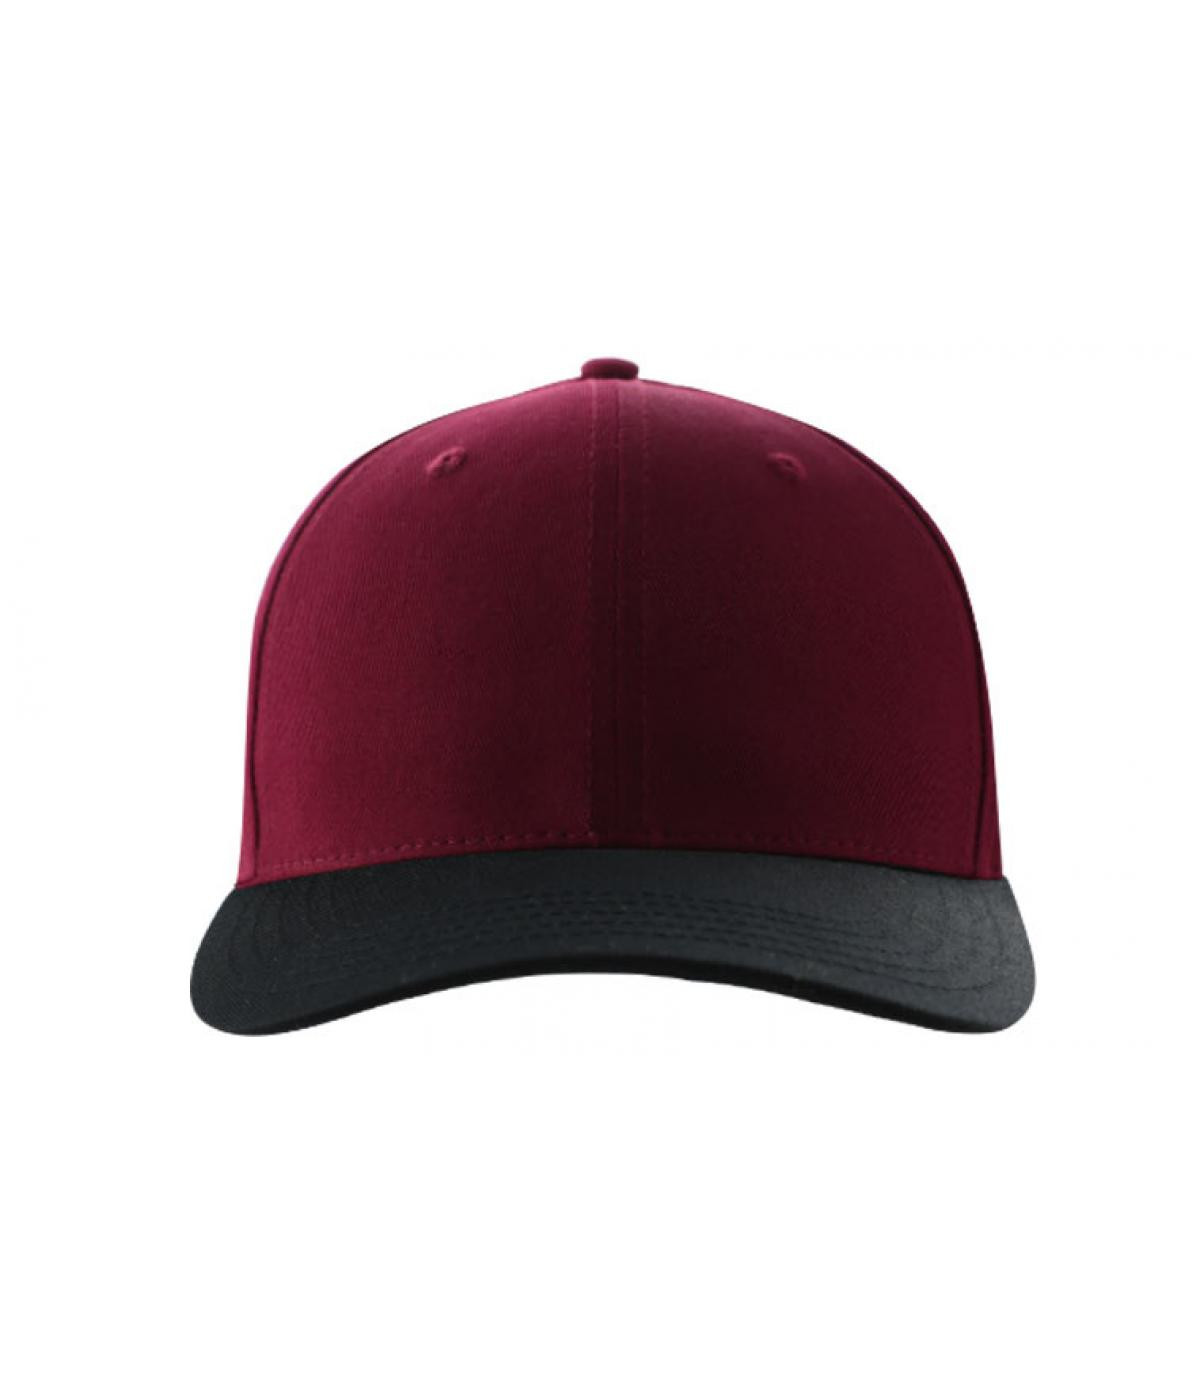 Curve blank burgundy black